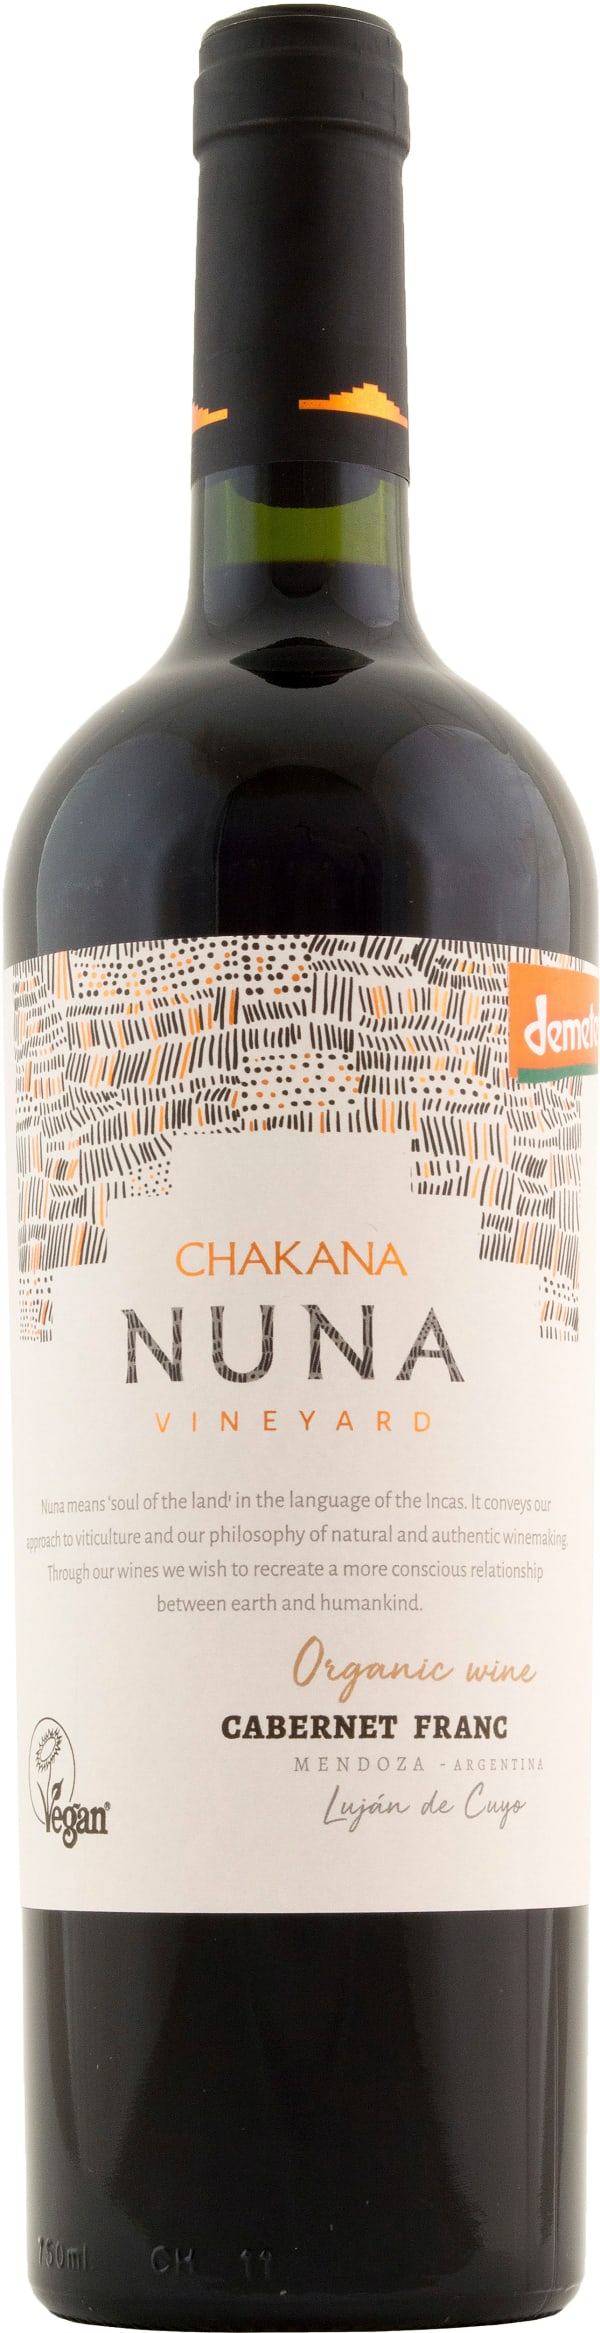 Chakana Nuna Vineyard Cabernet Franc 2019